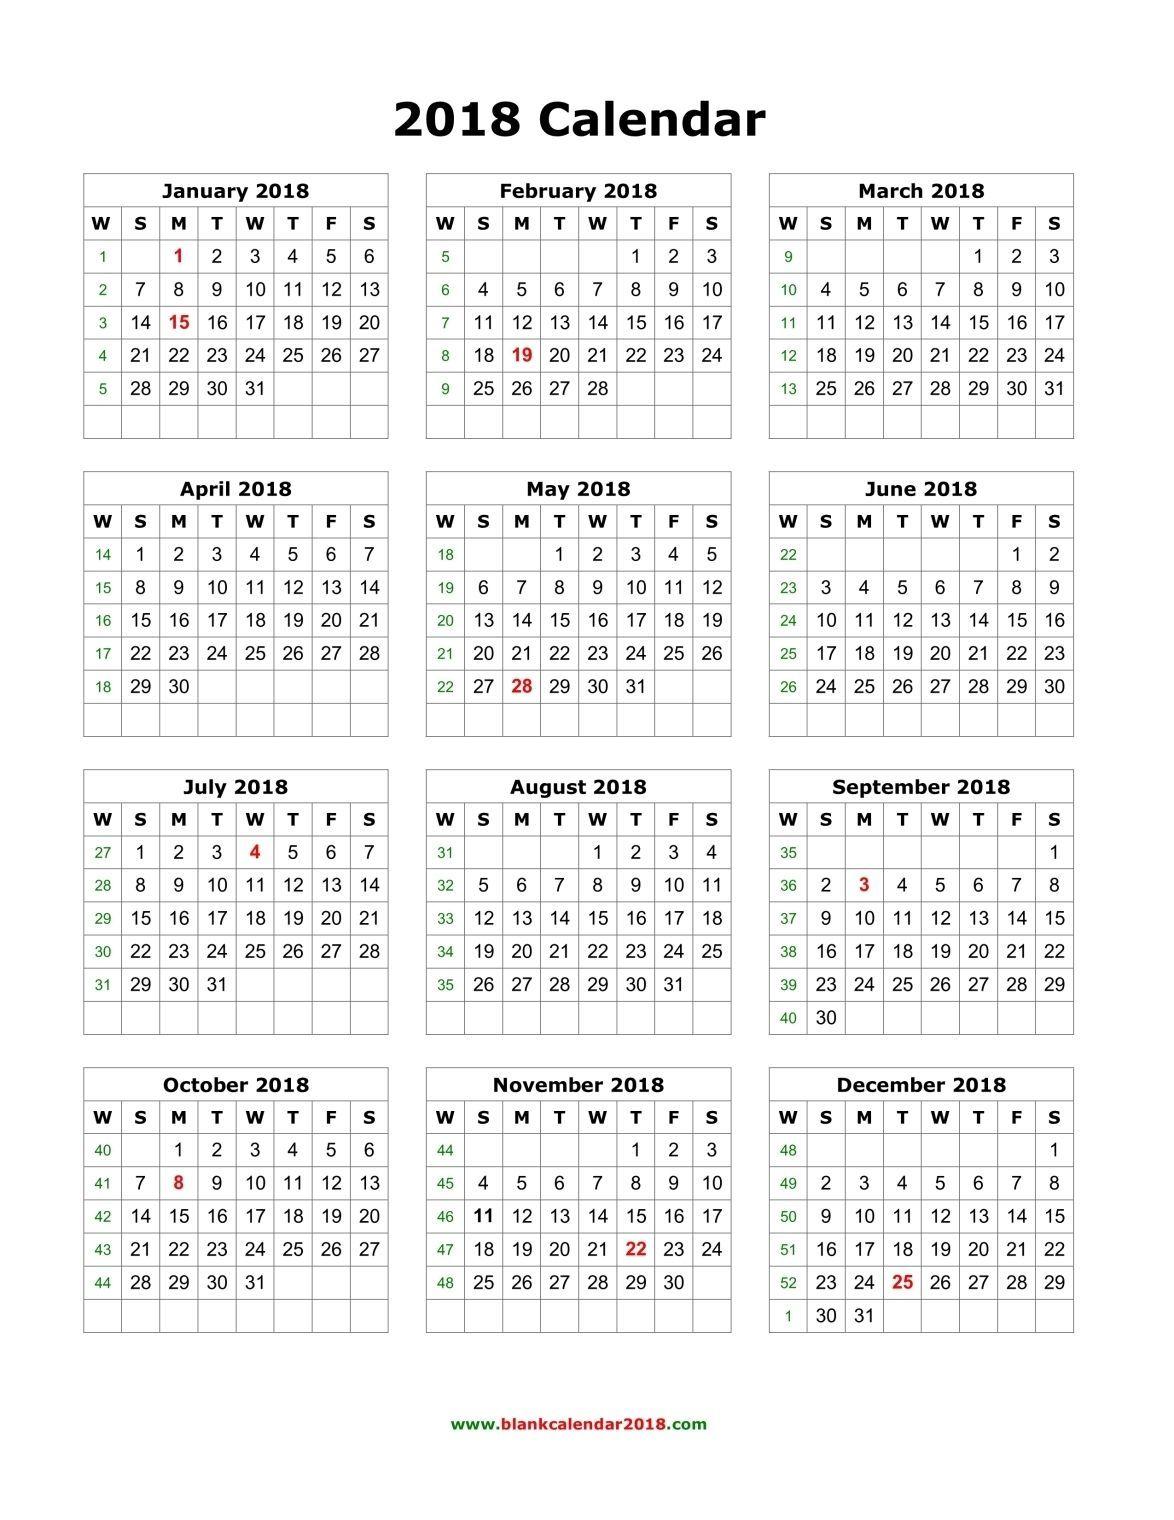 October 2018 Calendar Holidays Twice,  #annualcalendartemplate #Calendar #HOLIDAYS #October